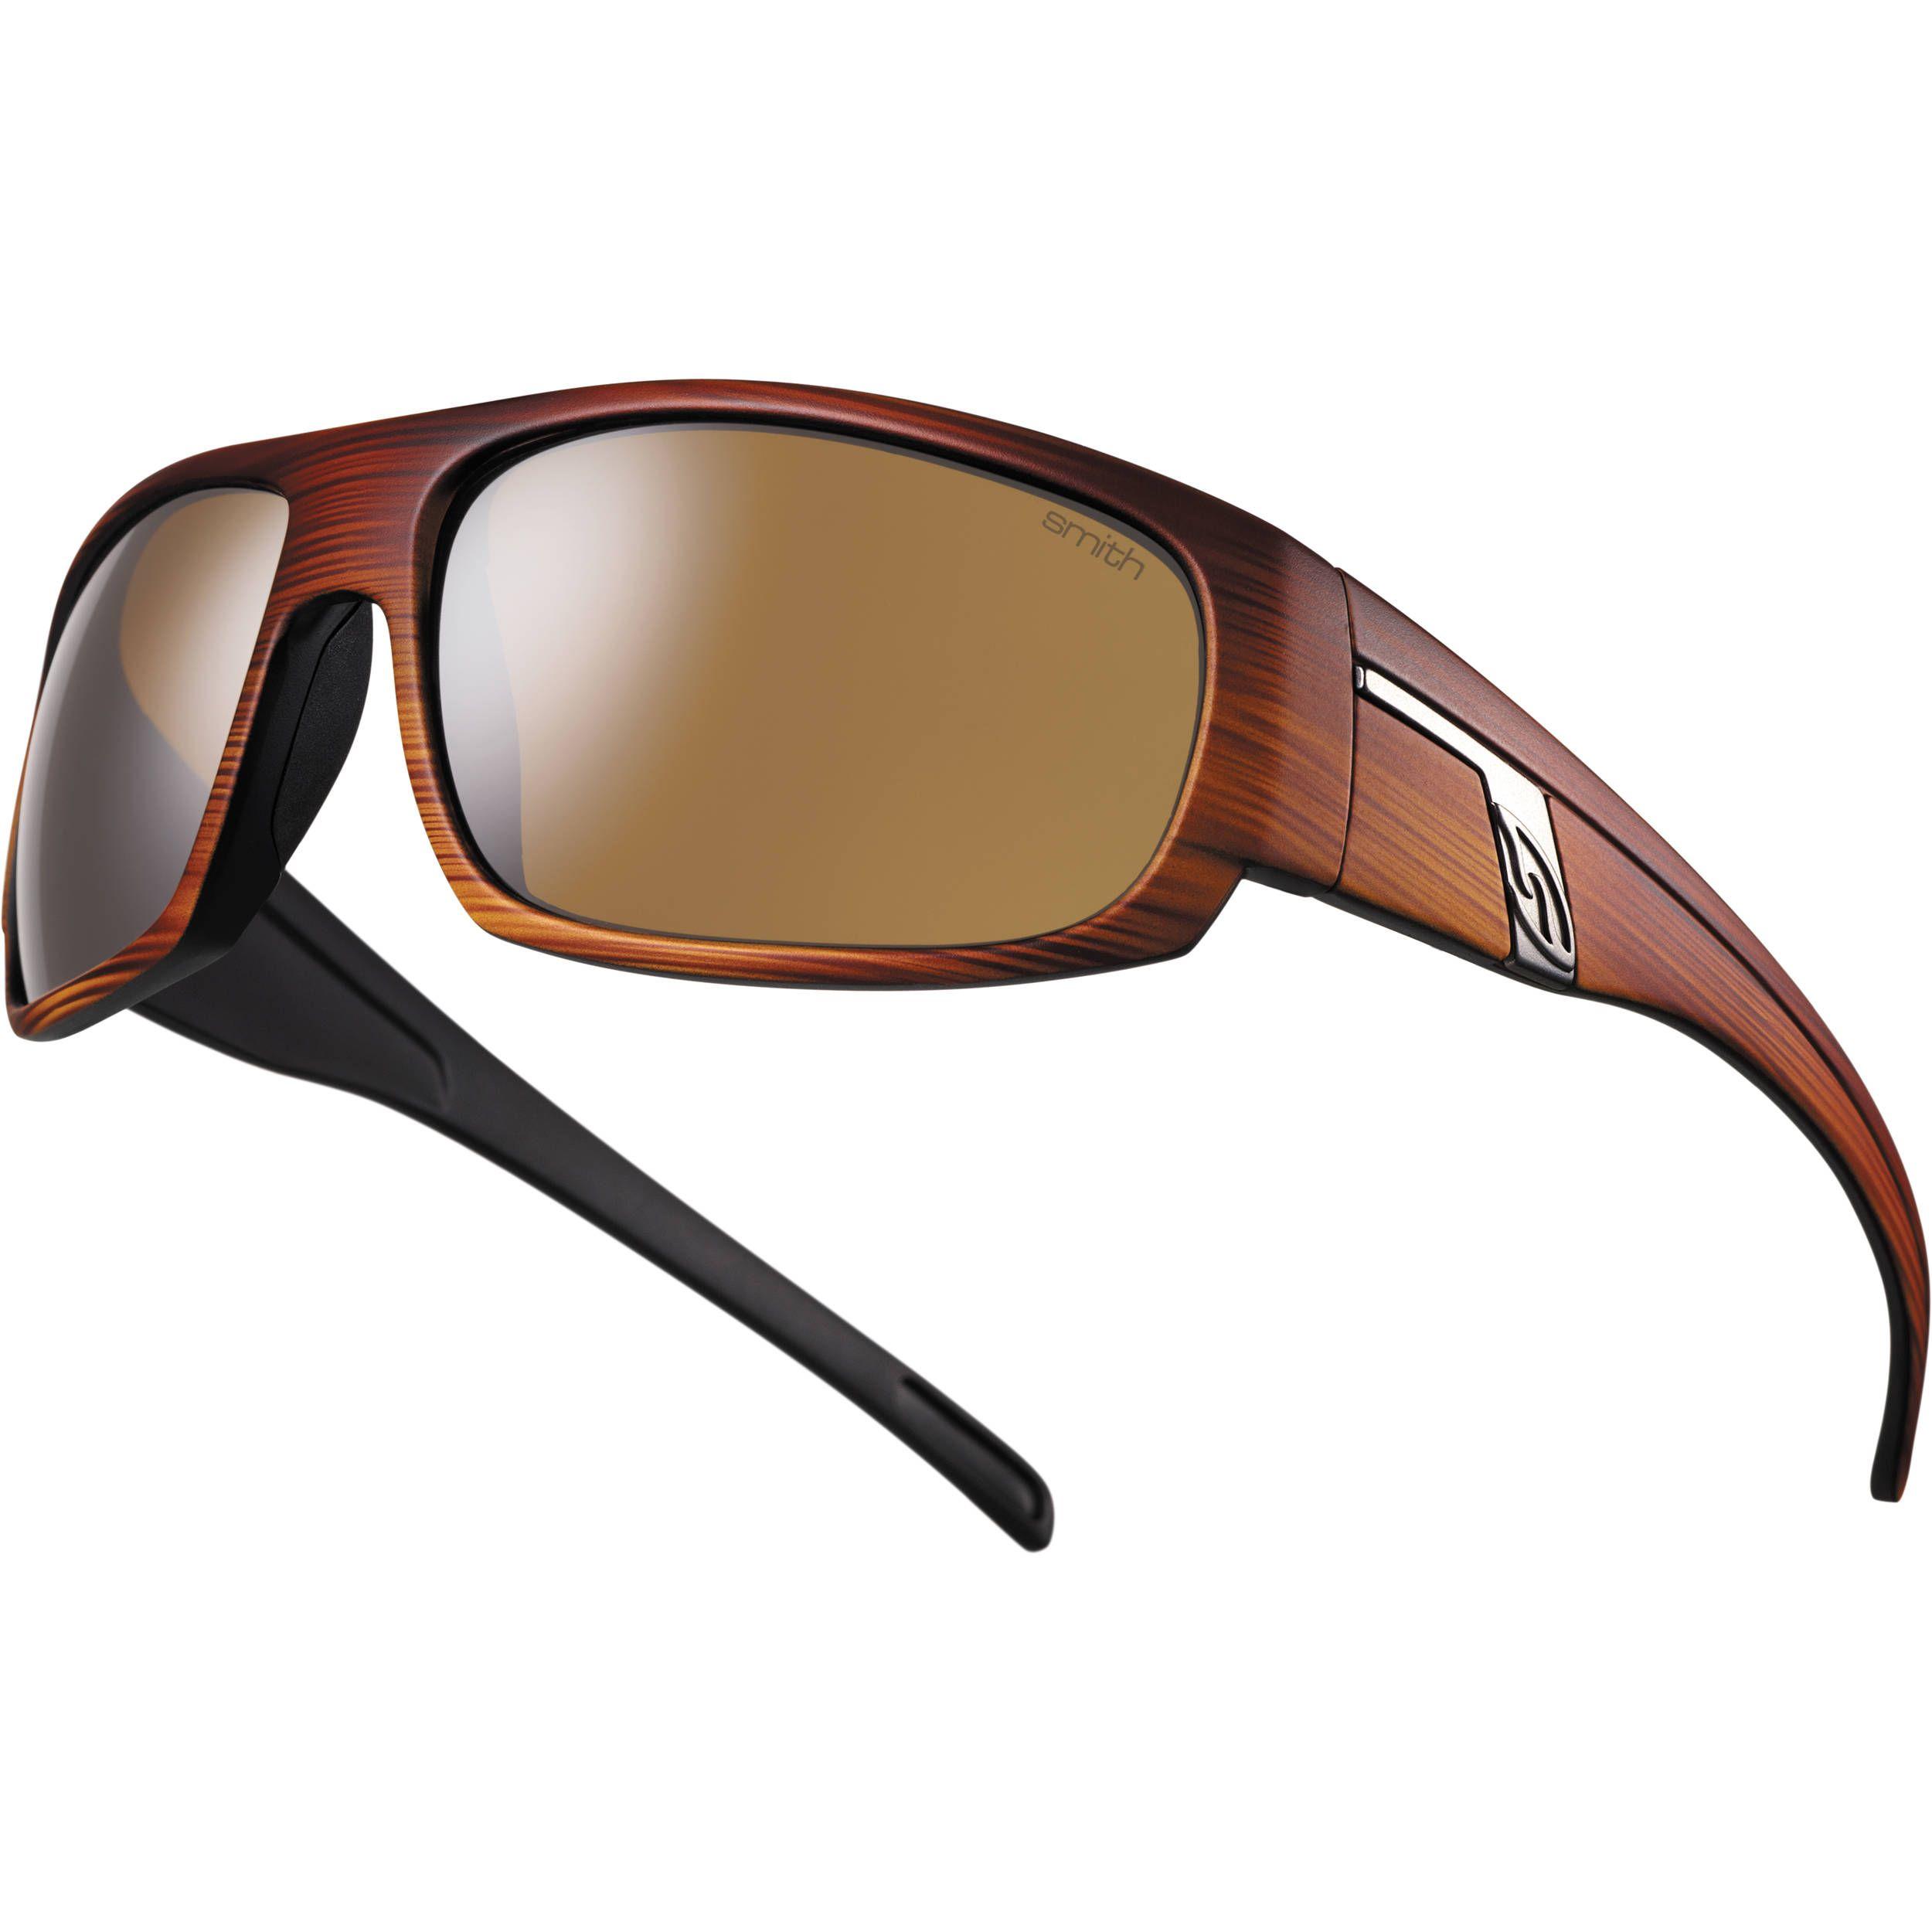 41f5f4a791 Smith Optics Terrace Sunglasses (Woodgrain - Polarized Brown Carbonic TLT)